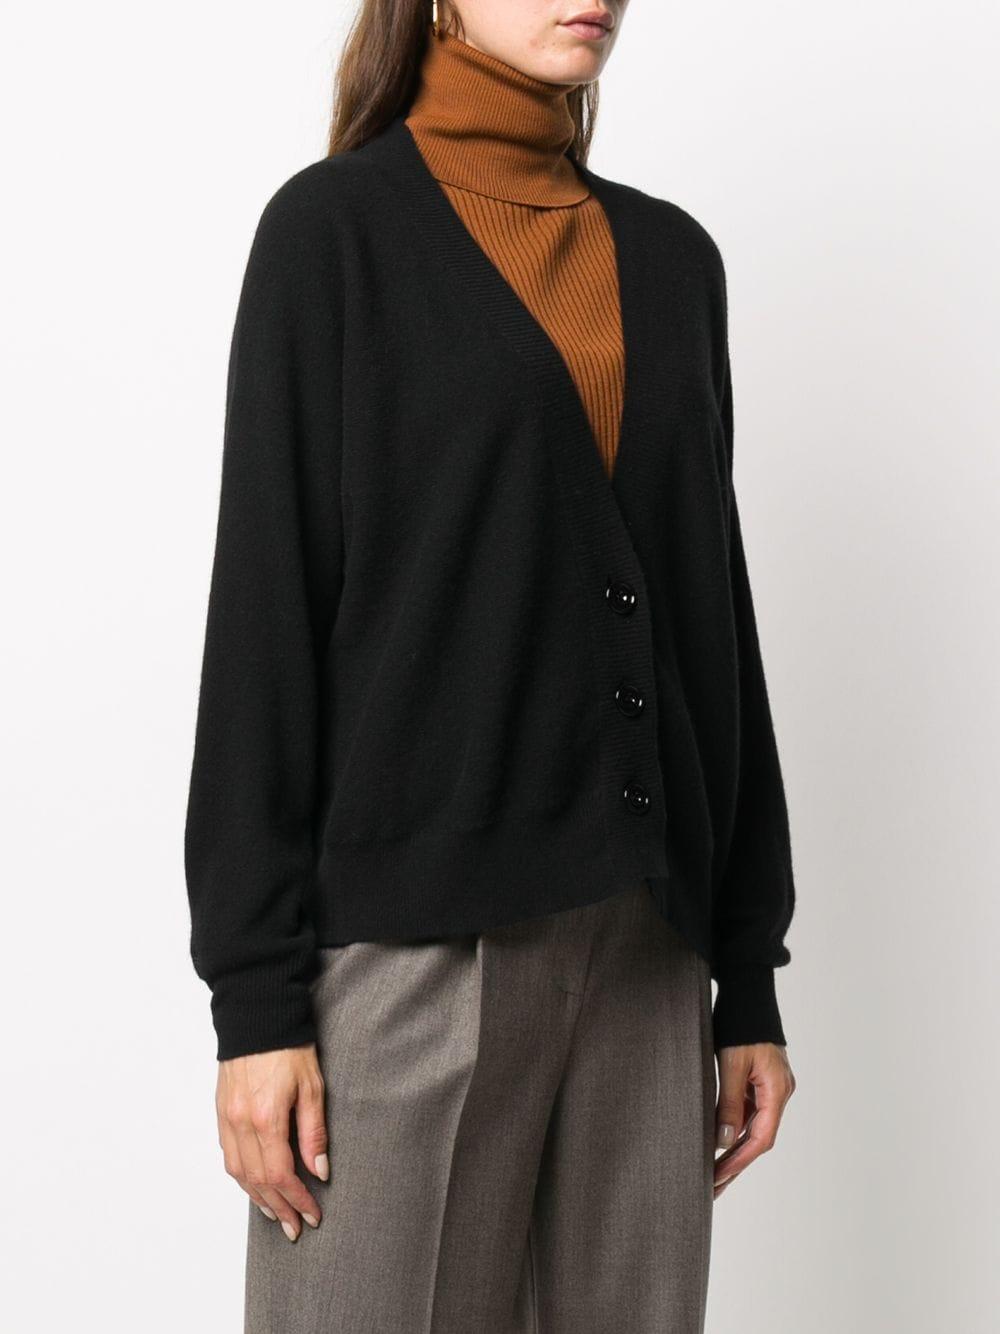 Black virgin wool and cashmere blend long-sleeve cardigan ALTEA |  | 206151490